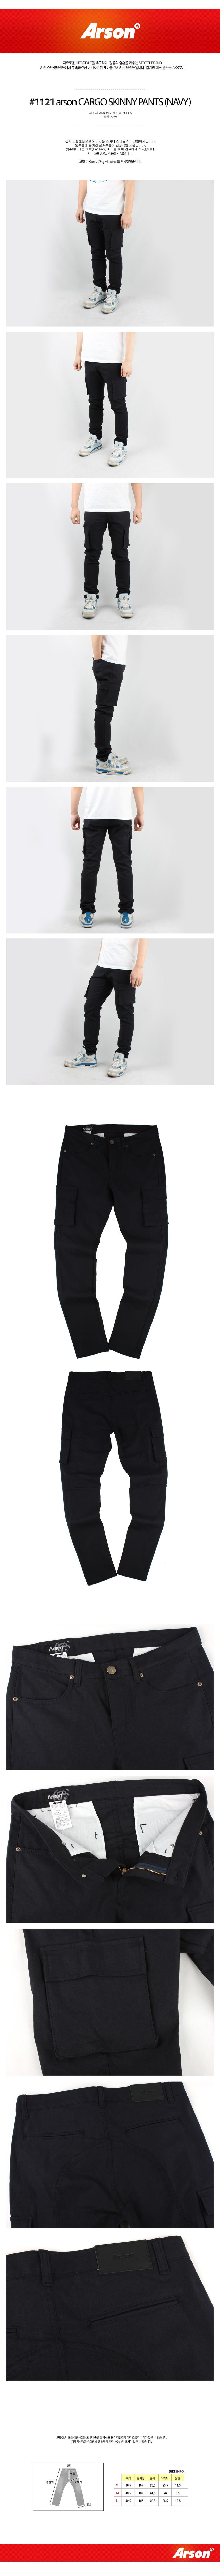 [ ARSON ] [Arson] ARSON GENUINE/ARSON 1121 CARGO PANTS (NAVY)/pants/longpants/cargopants/cottonpants